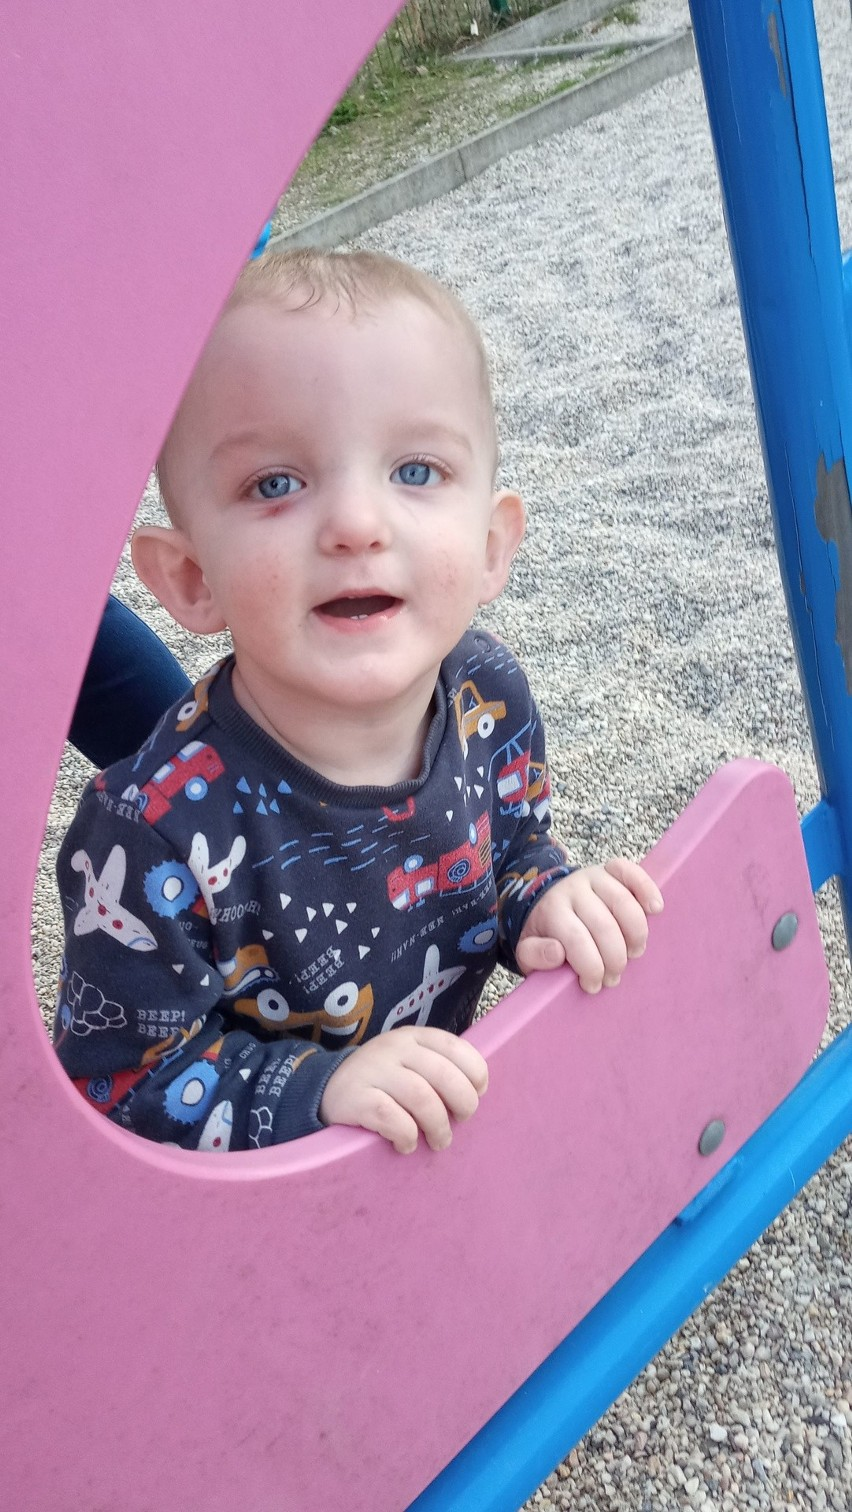 Niestety, ale podczas zabawy na podwórku, 2-letni Michałek...